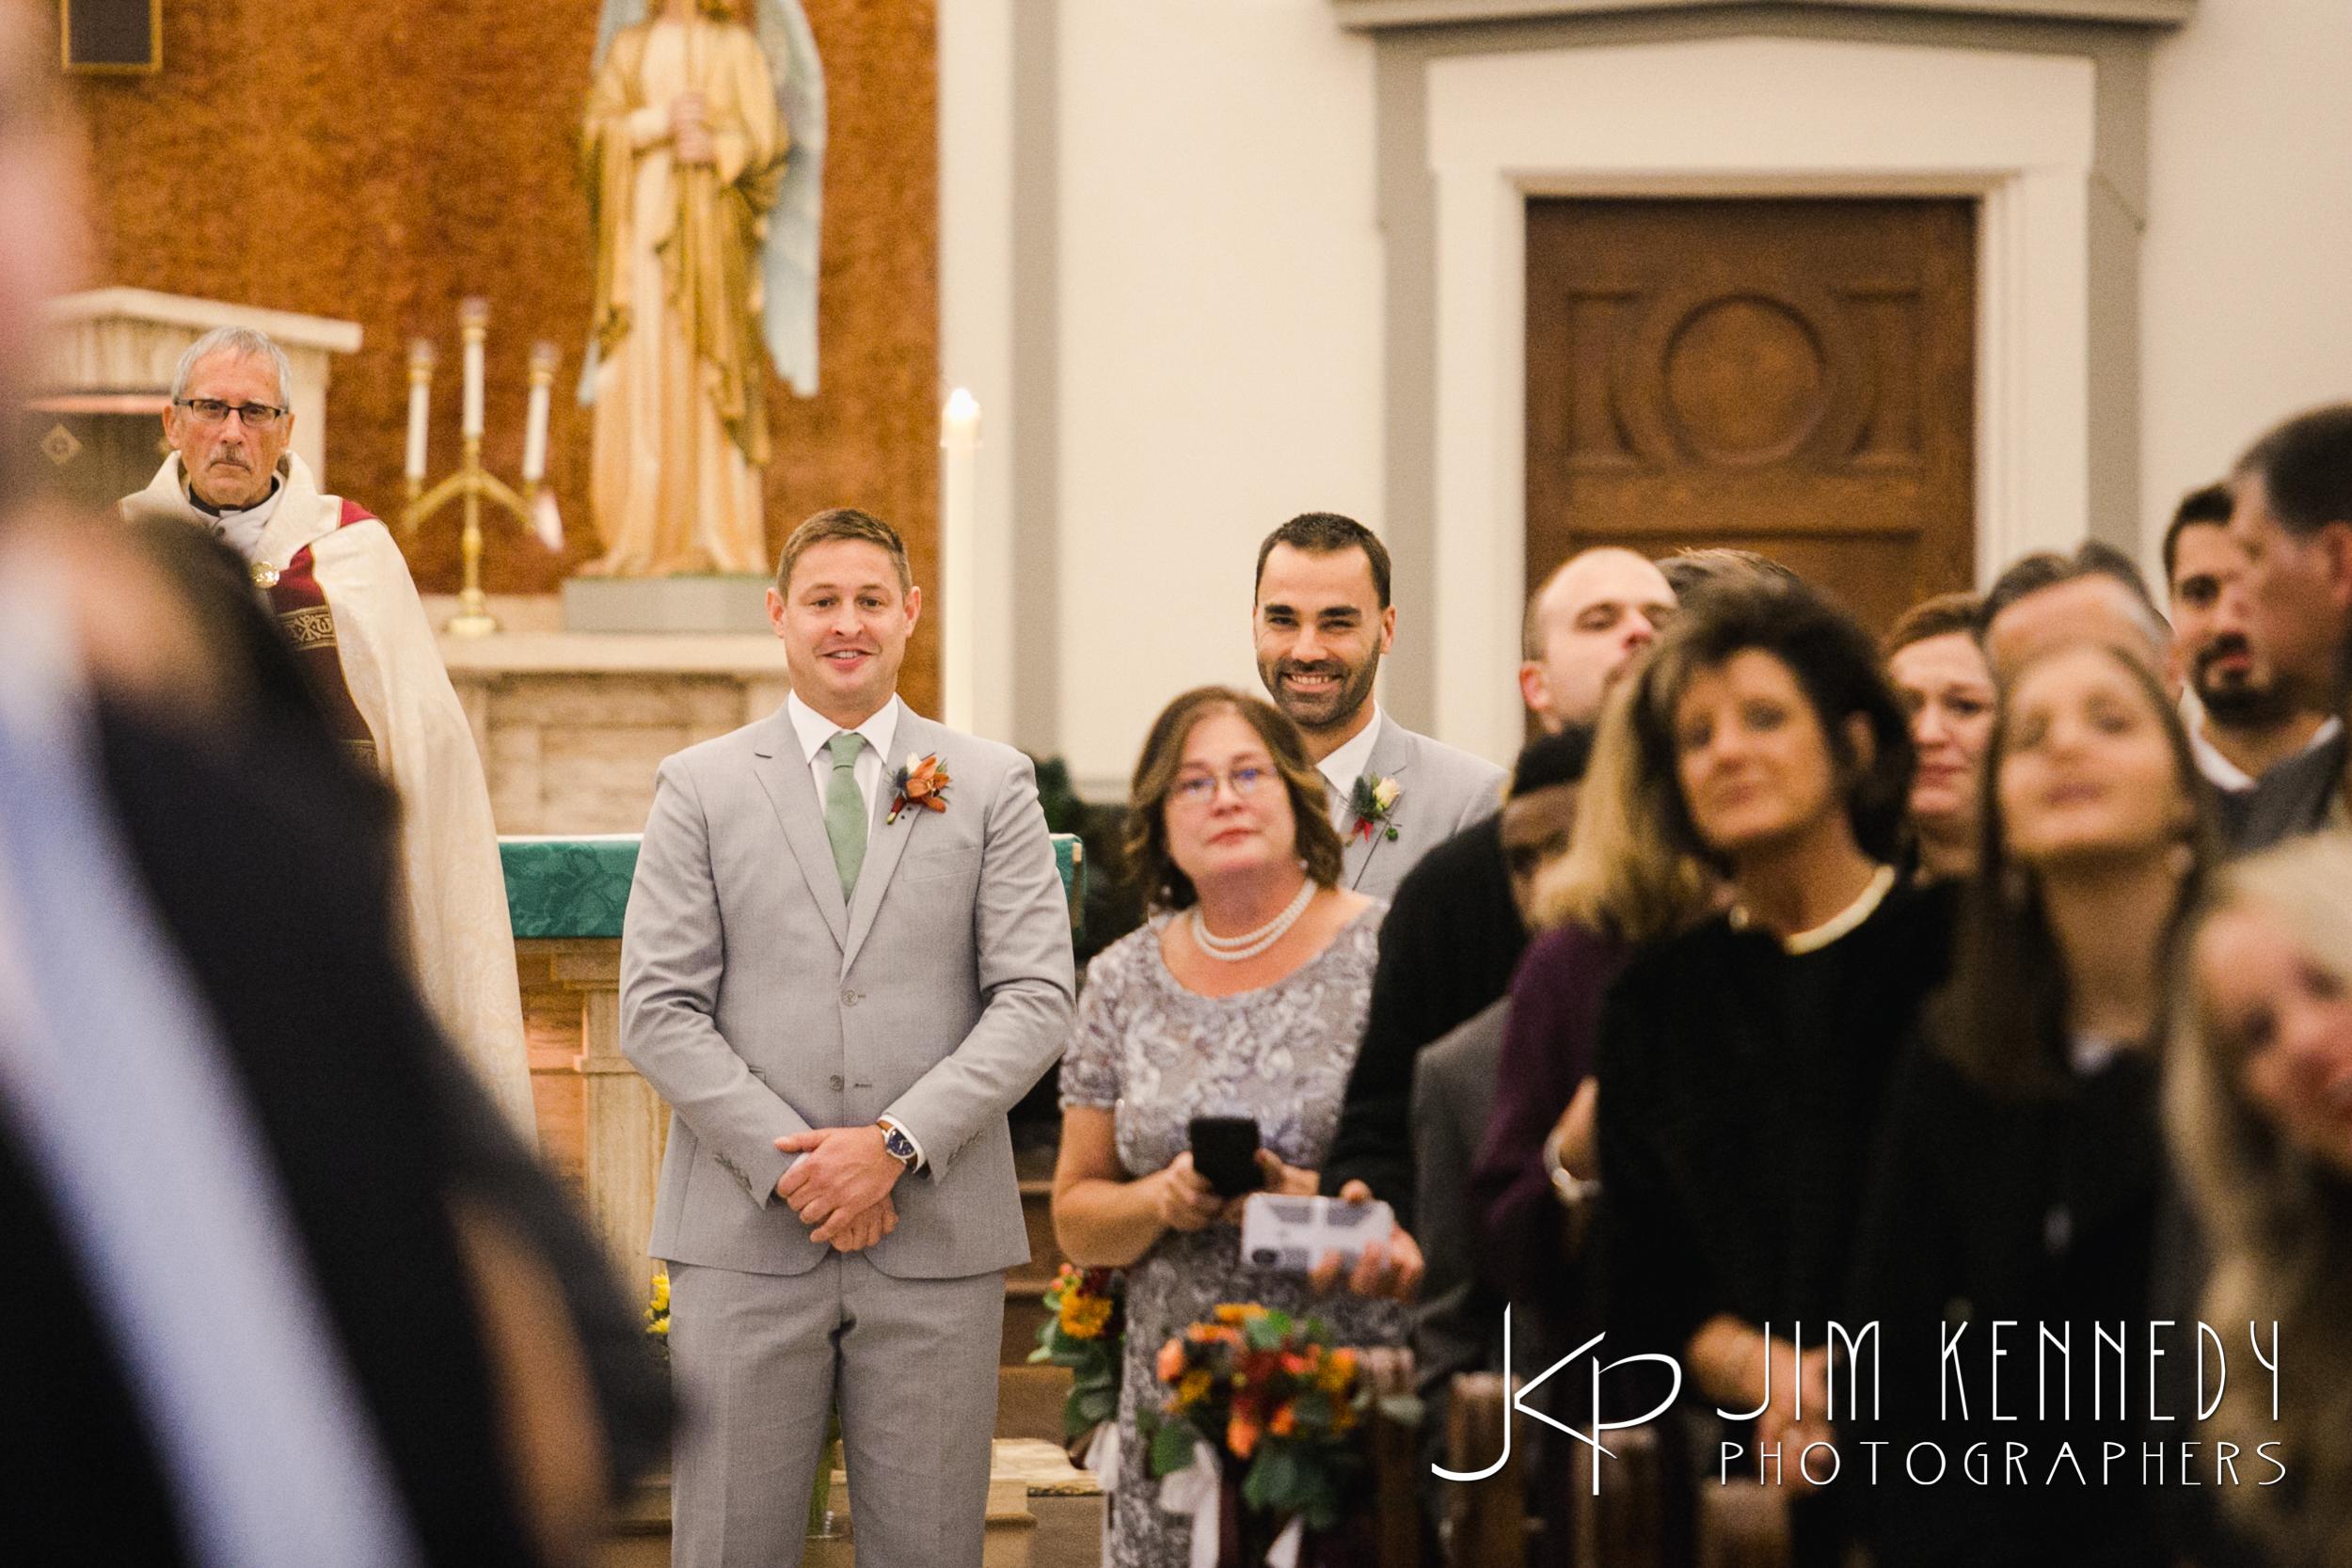 van-dusen-mansion-wedding-058.JPG